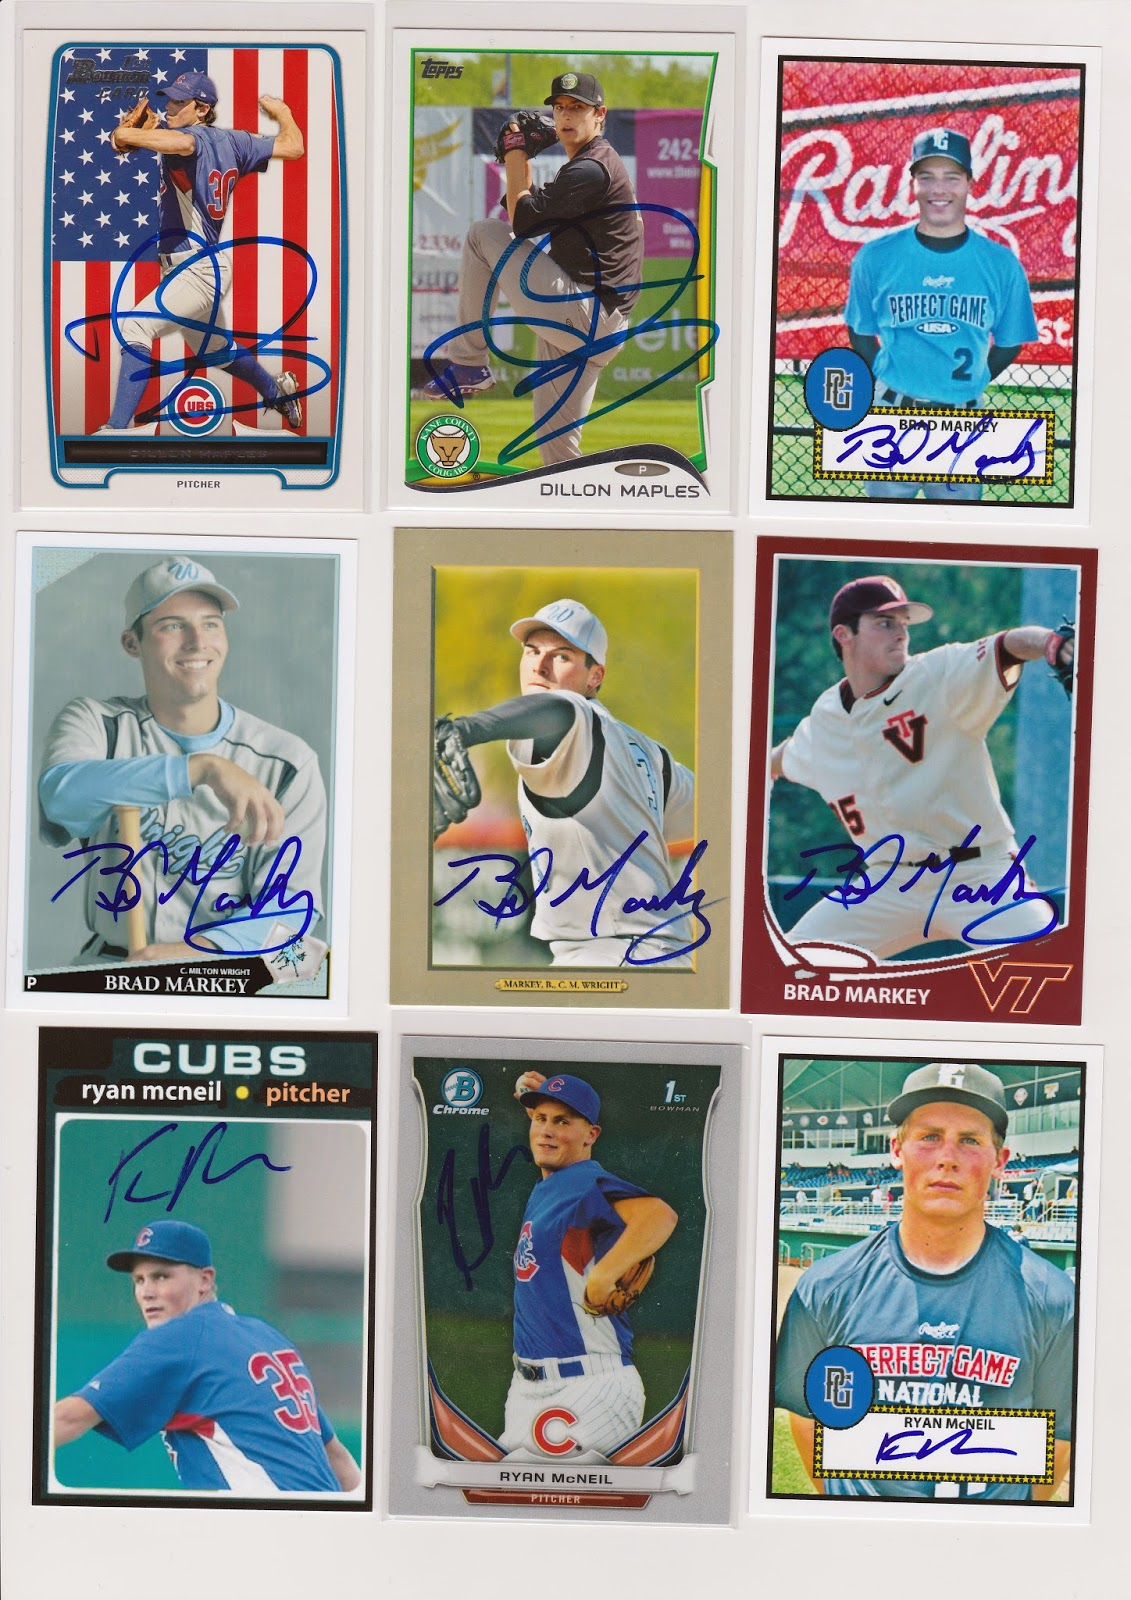 Verzamel En Ruilkaarten Chicago Cubs Austin Reed Signed 2012 Peoria Chiefs Card Auto Verzamelingen 1840apartments Com